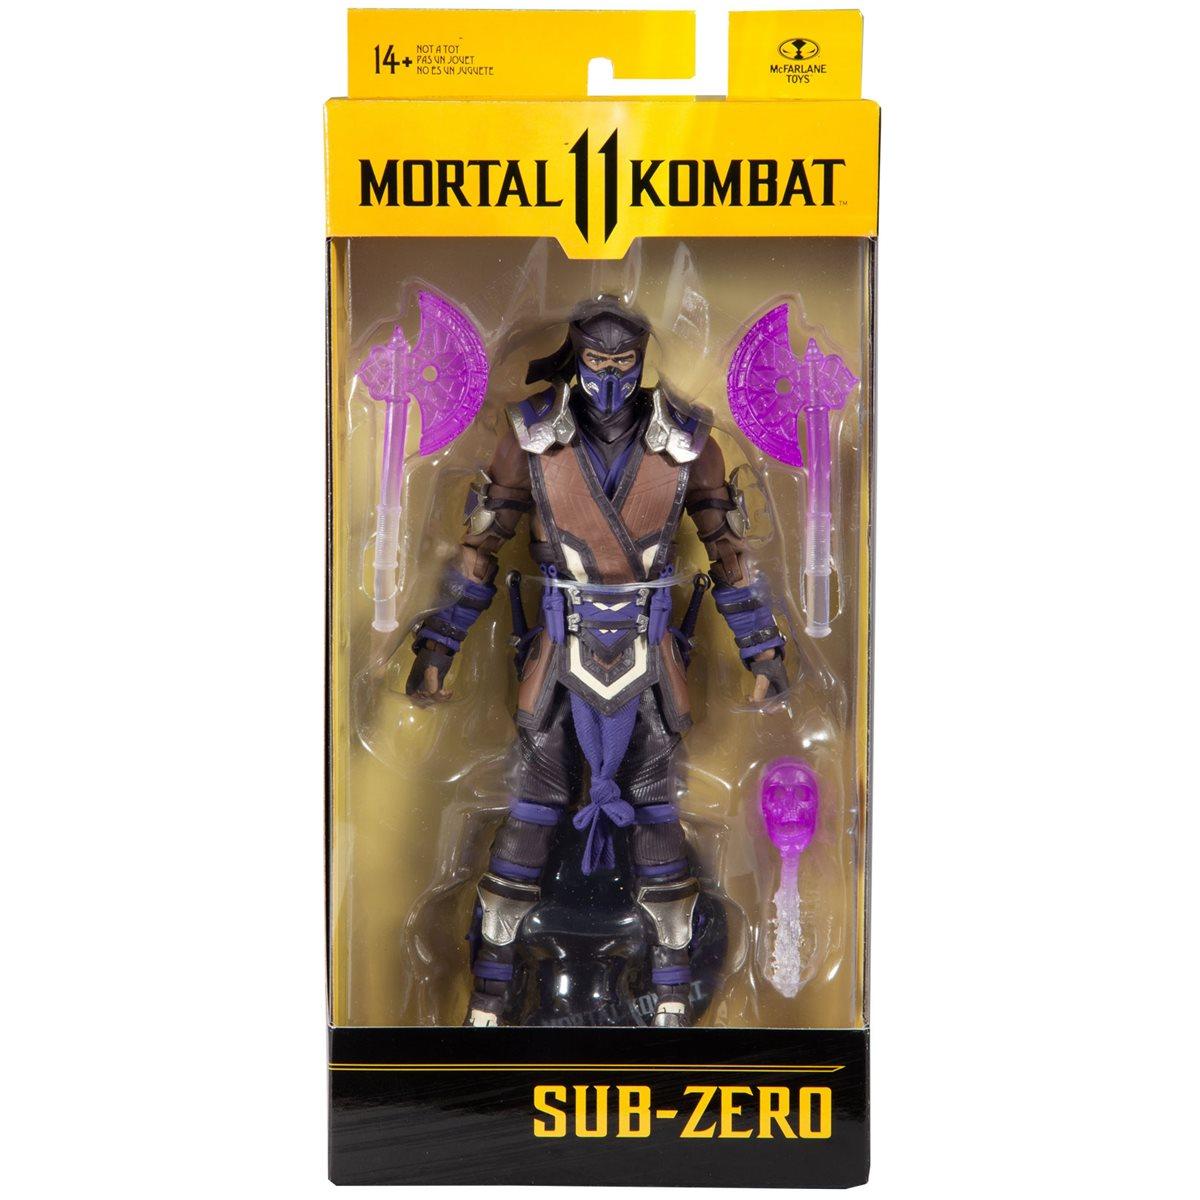 Mortal Kombat Series 5 7-Inch Action Figure Sub-Zero Winter Purple Variant